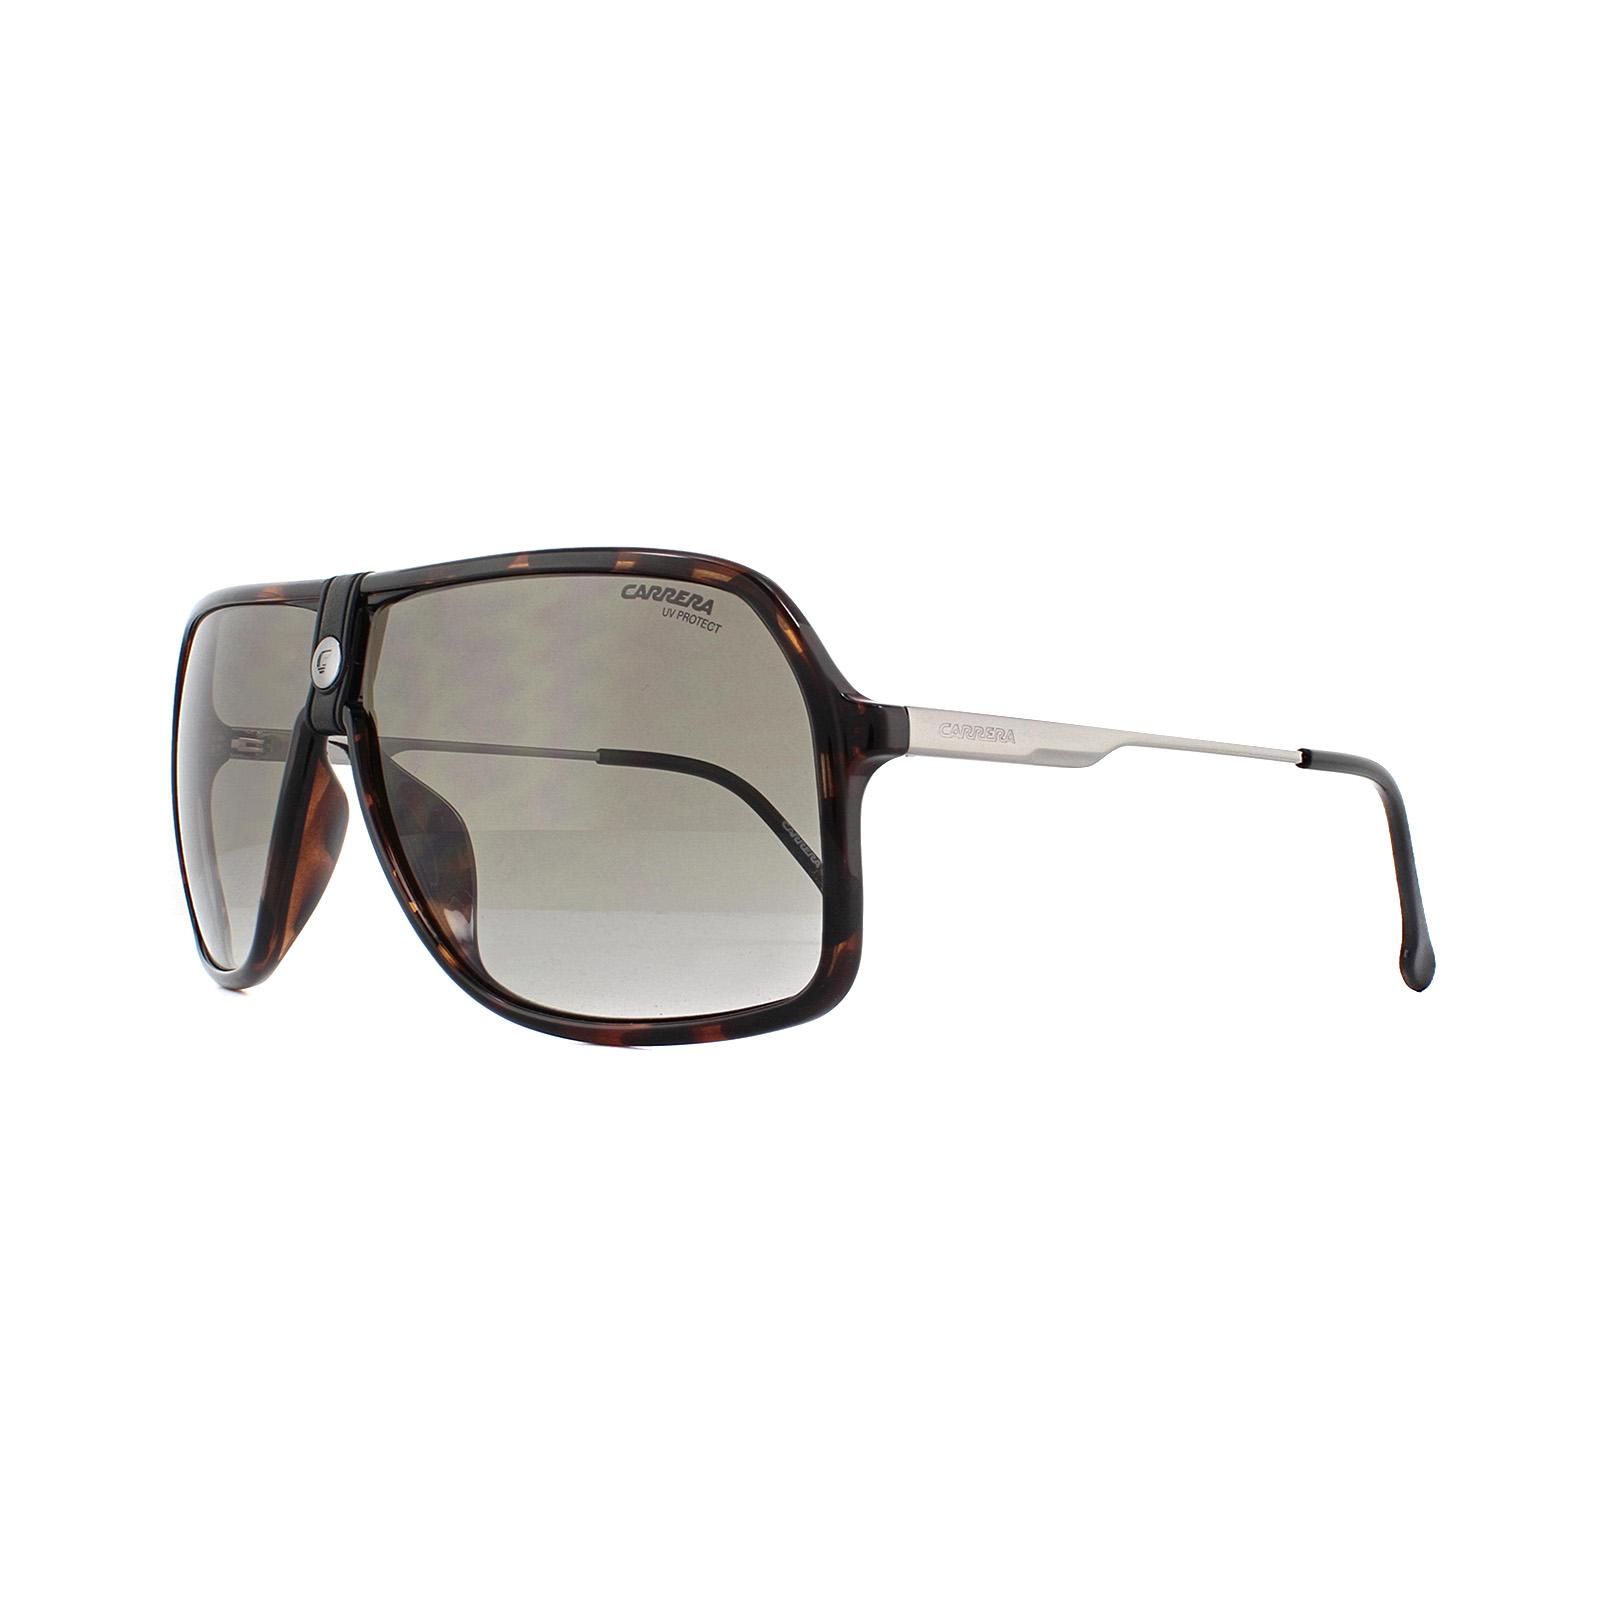 52d42c753015 Sentinel Carrera Sunglasses 1019/S 086 HA Dark Havana Brown Gradient